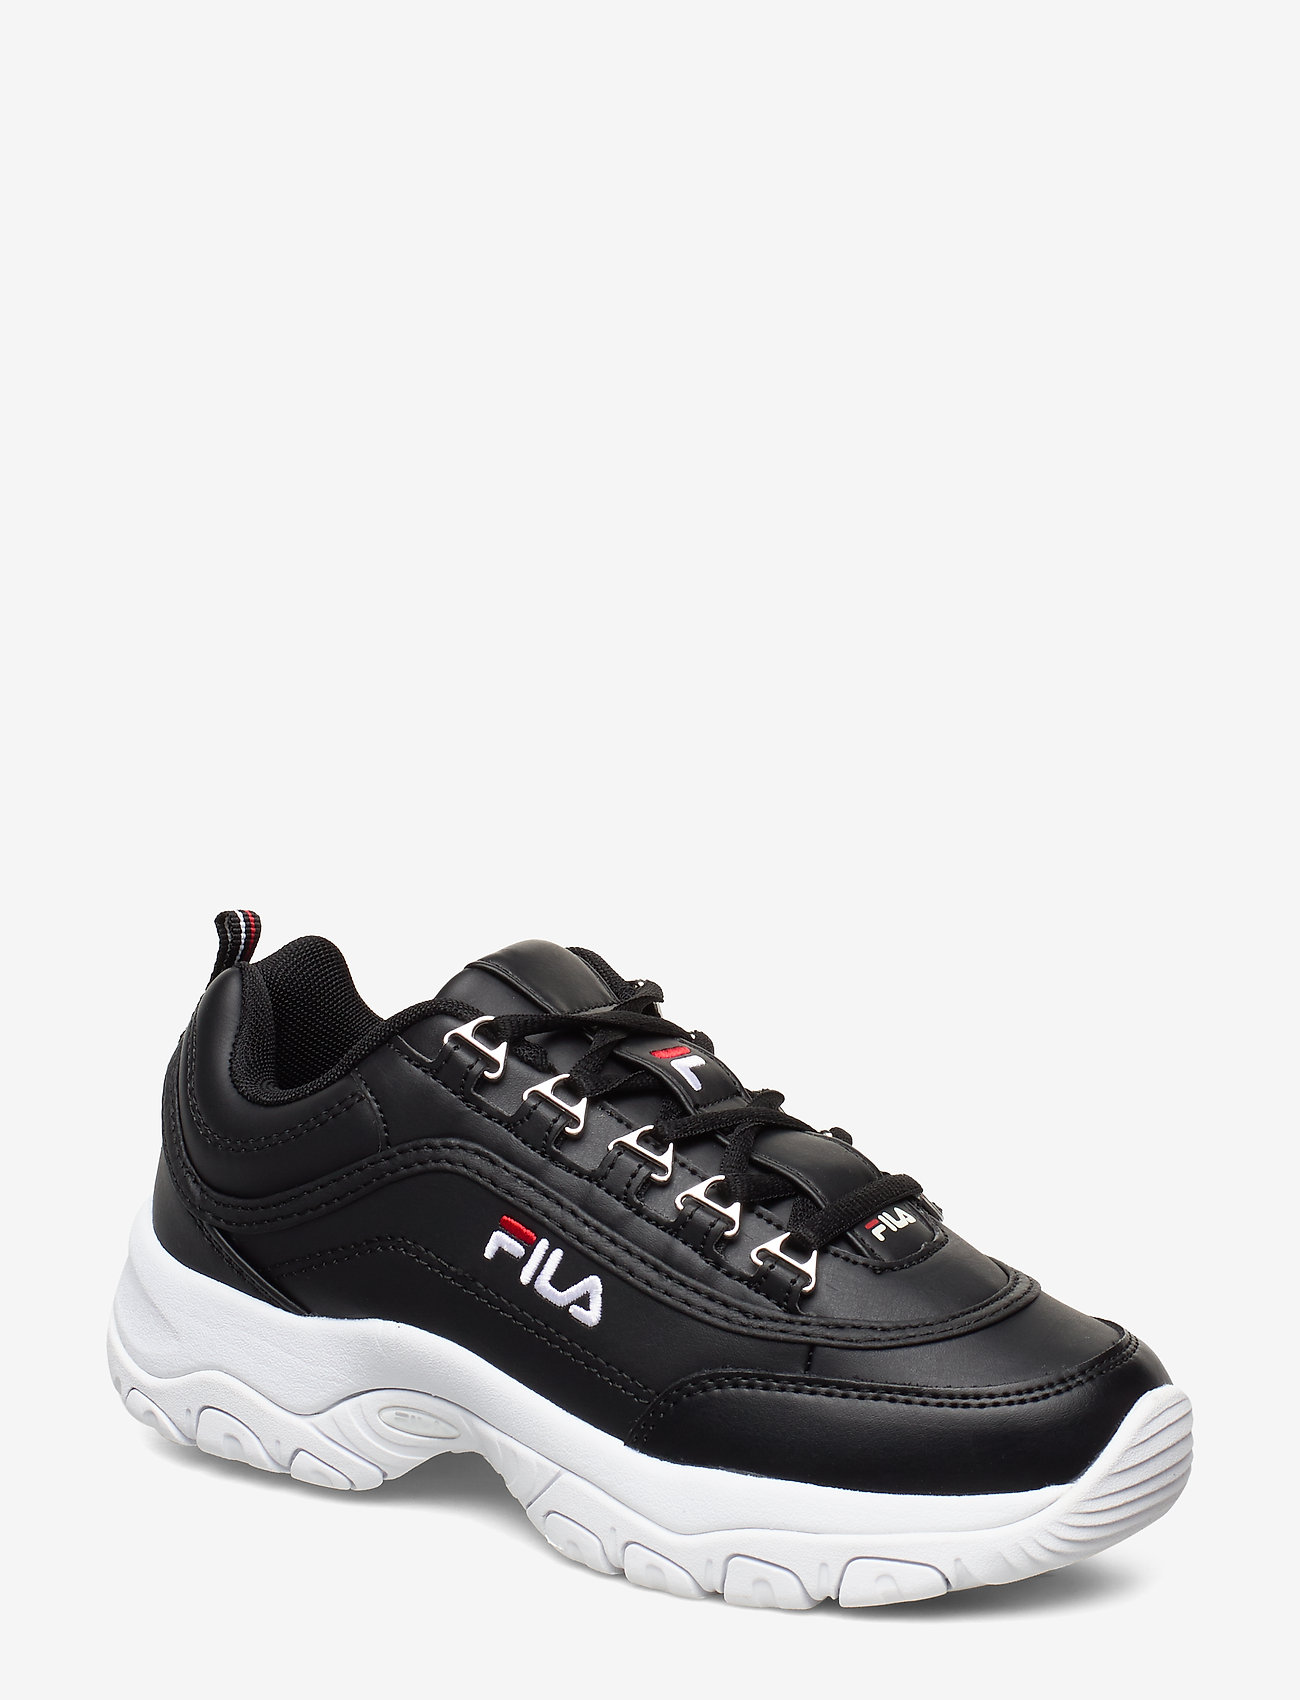 FILA - Strada low wmn - baskets épaisses - black - 0